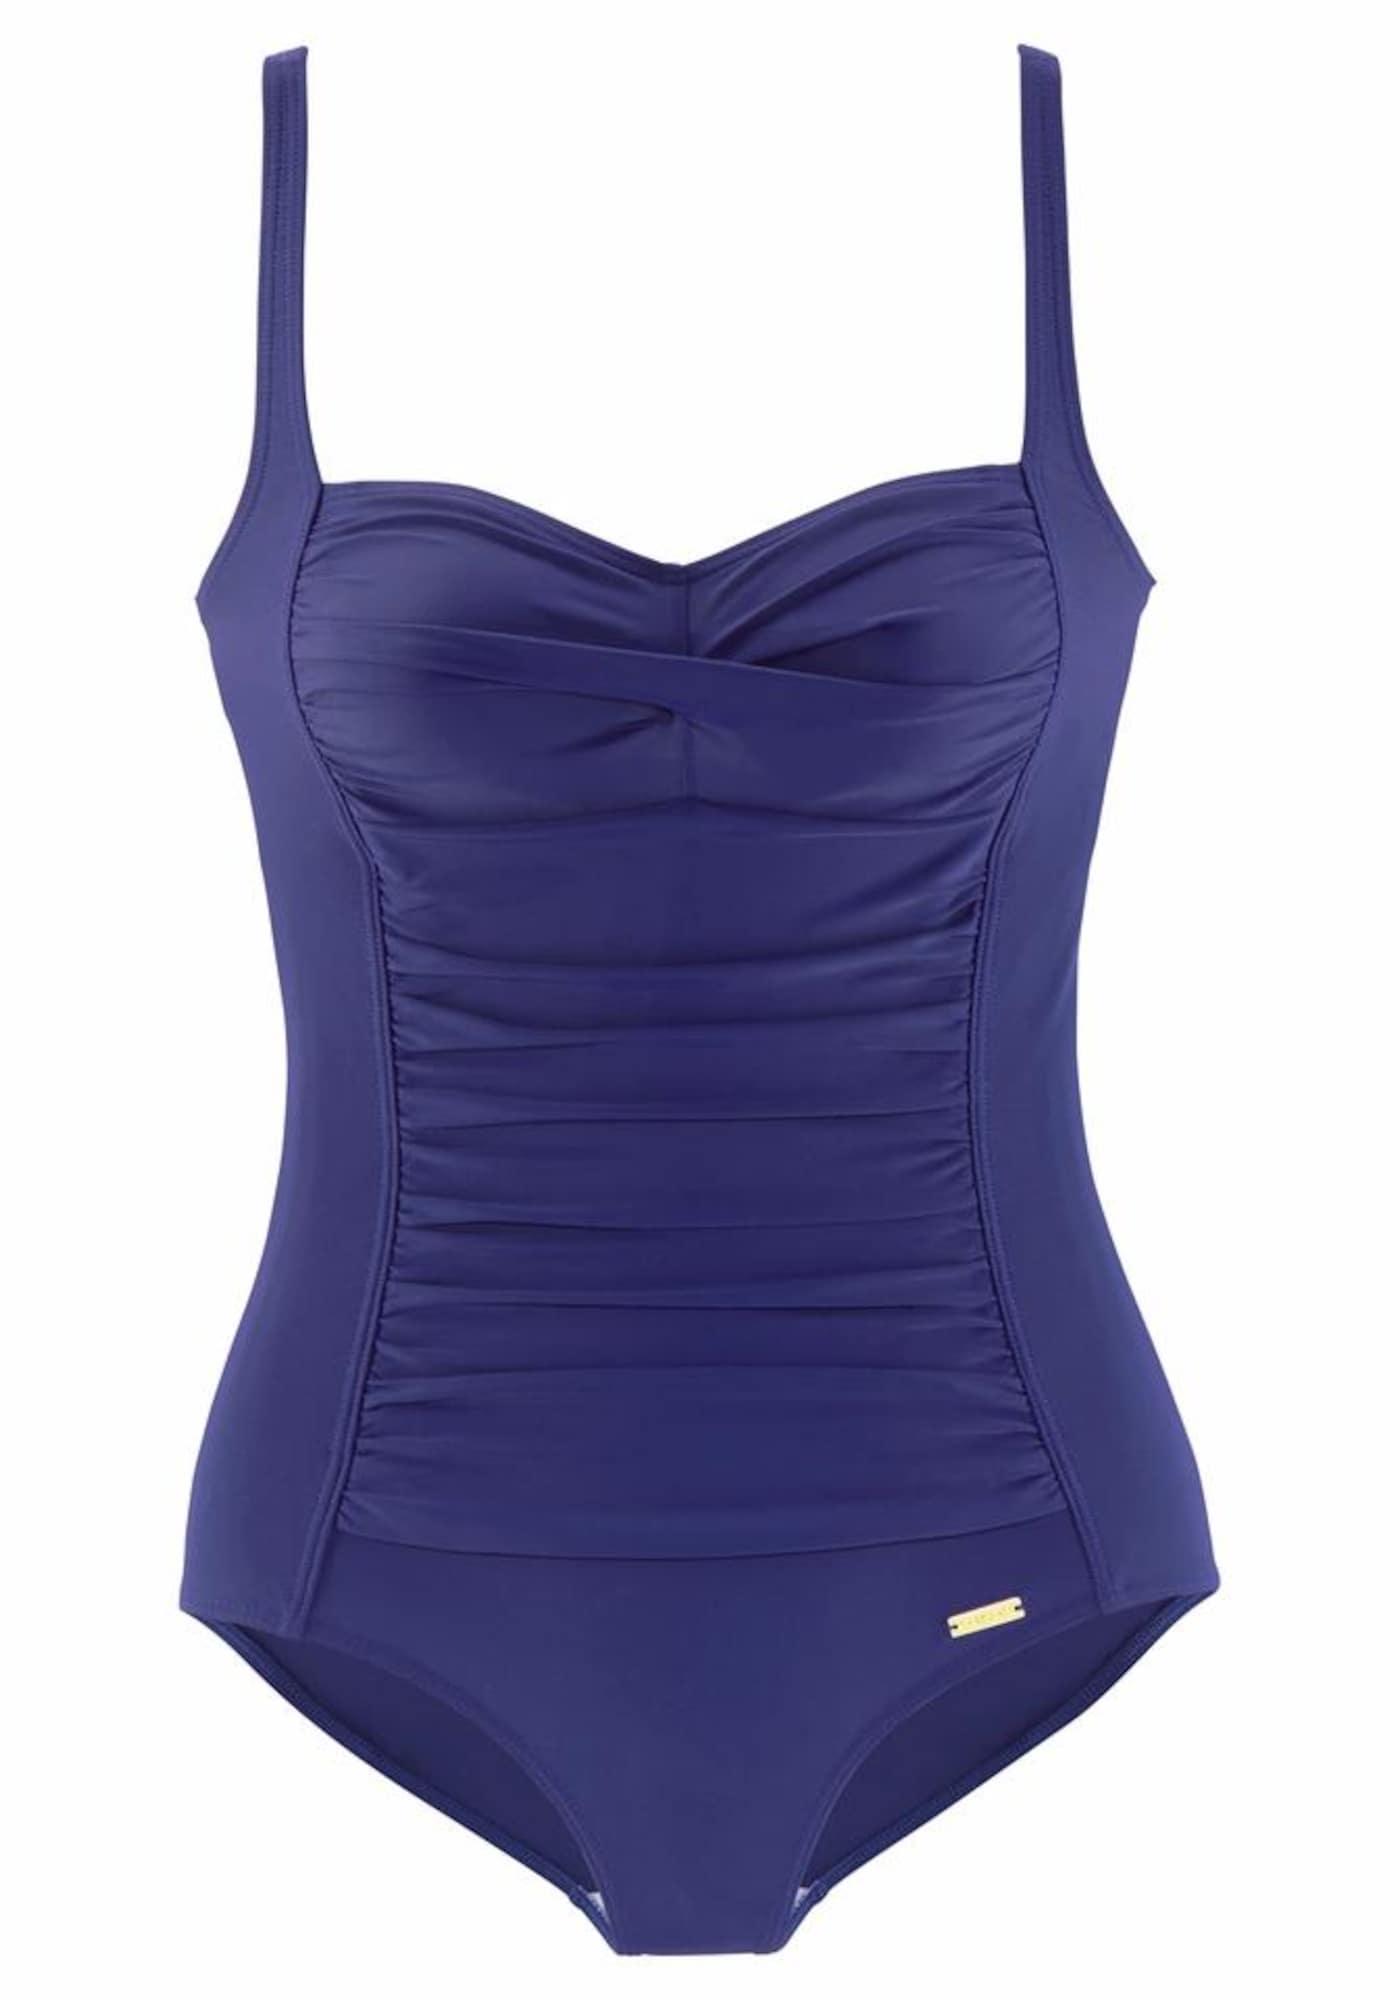 LASCANA Maillot de bain  - Bleu - Taille: 42 - female